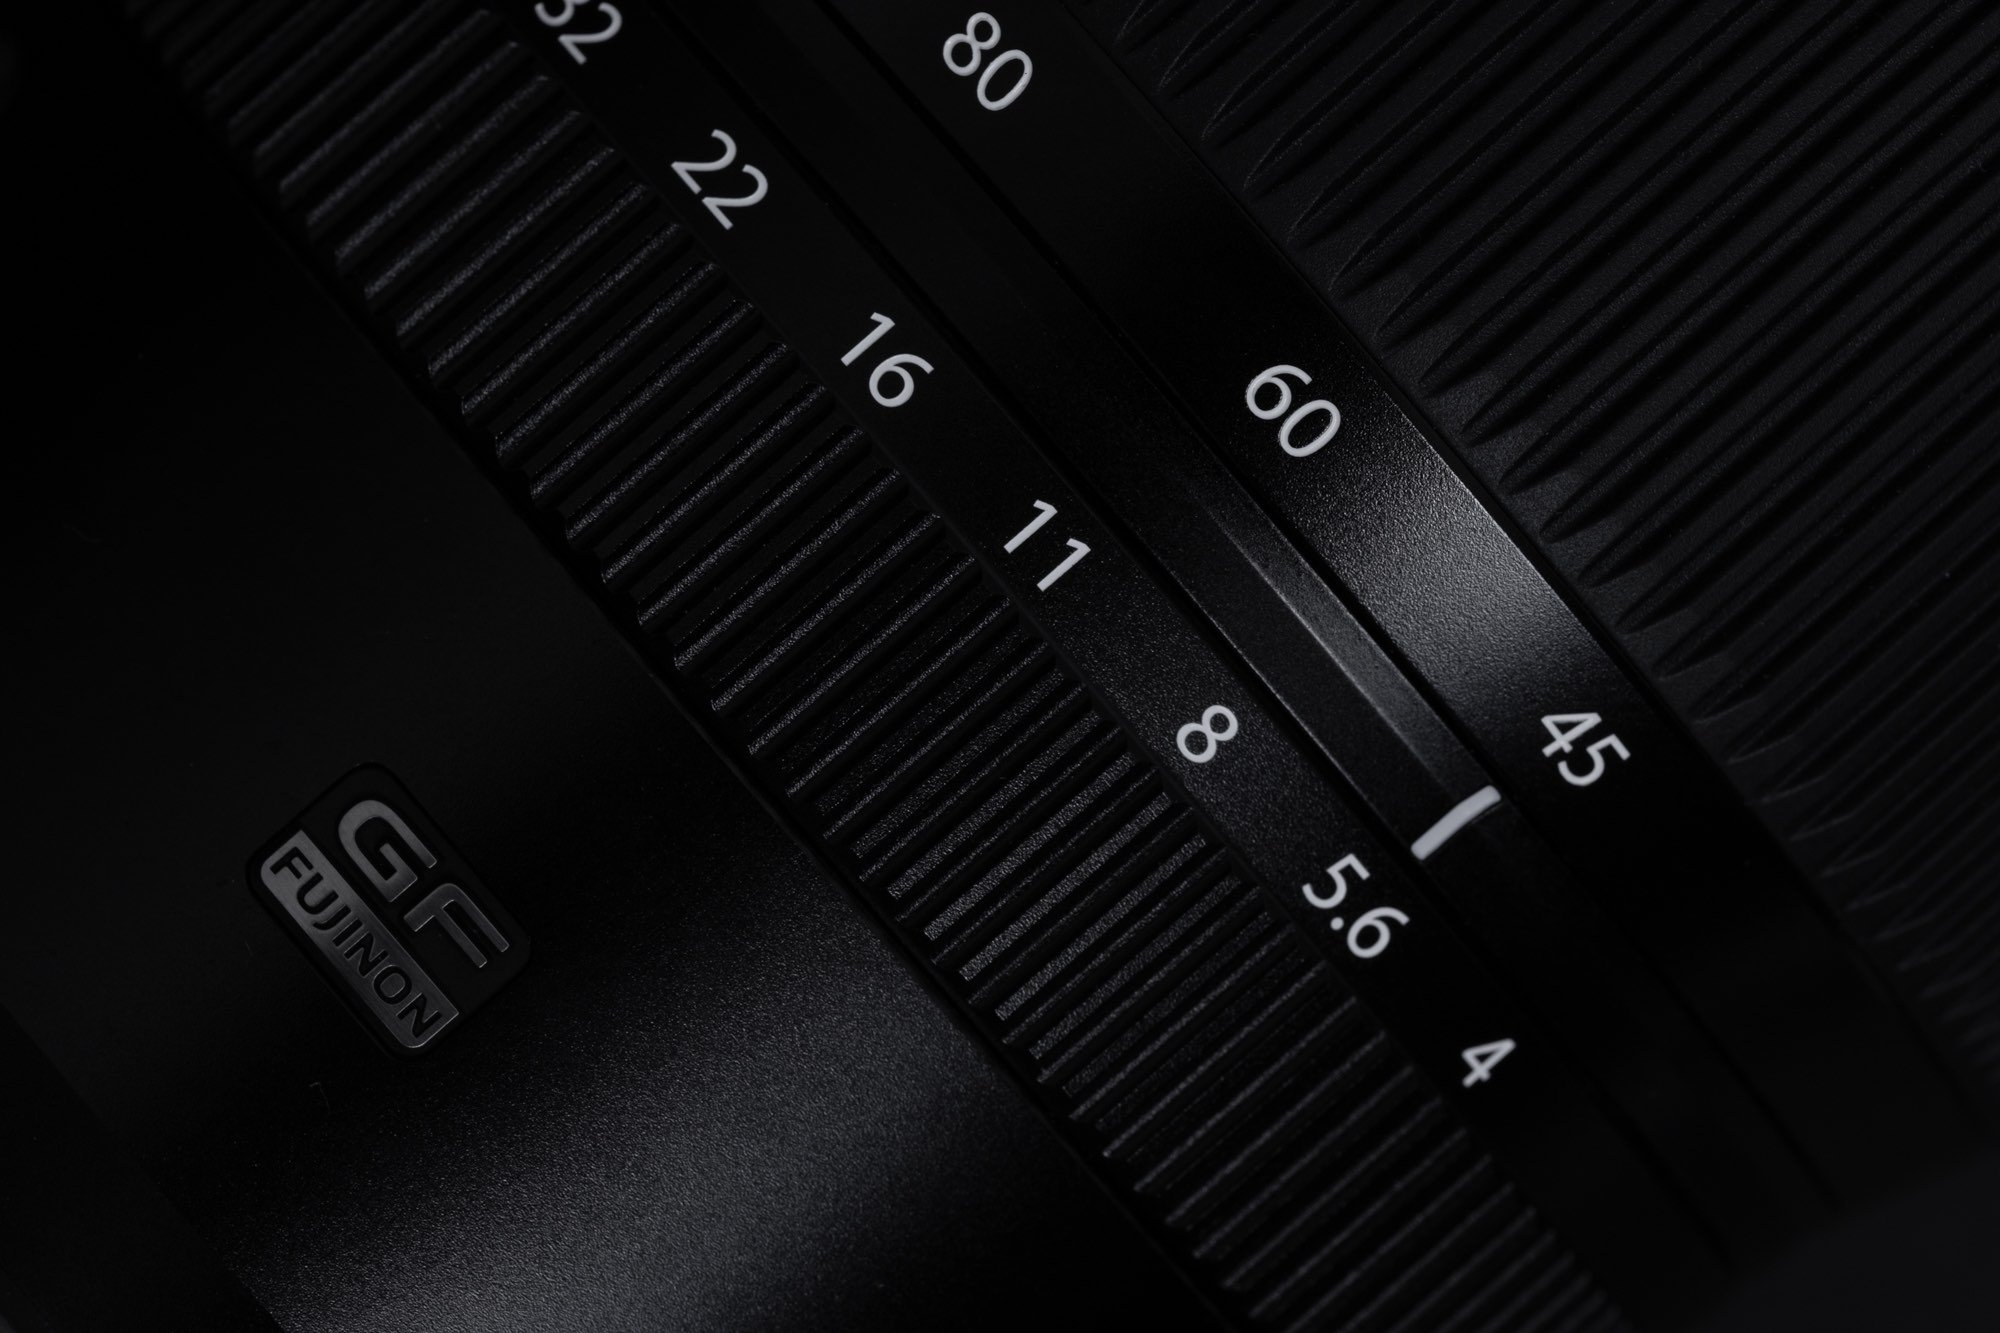 FUJIFILM GF 45-100mm lens Product Photography Singapore Jose Jeuland 4